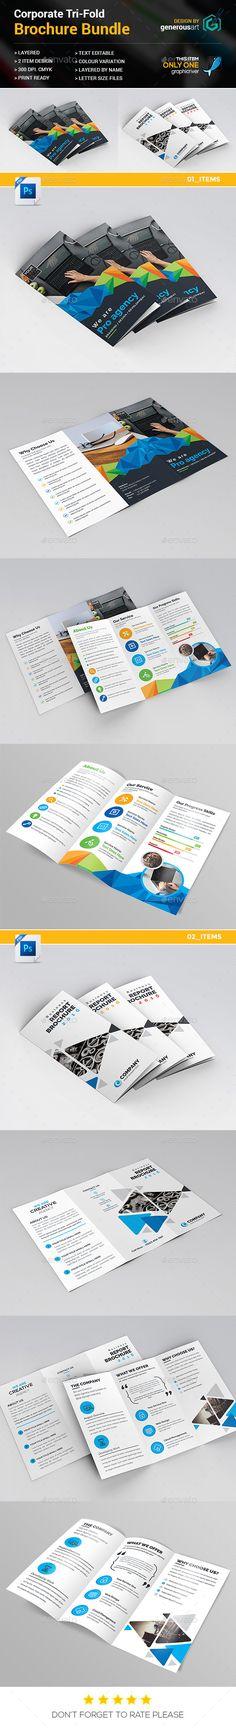 Tri-fold Brochure Template PSD Bundle 2 in 1